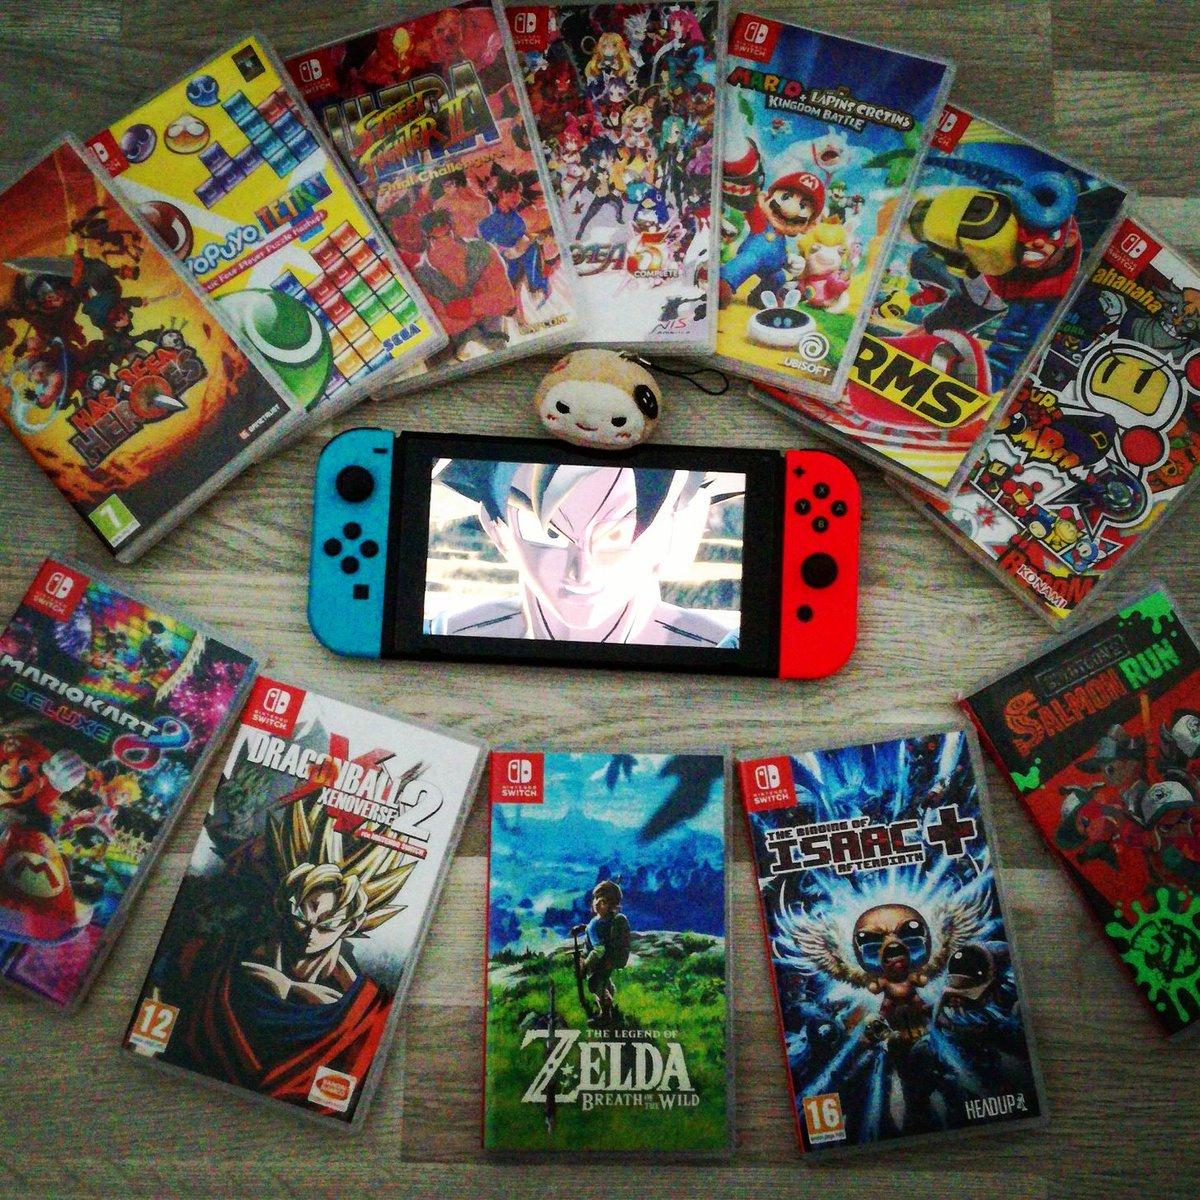 No games on switch? #zeldabreathofthewild #mk8d #mariorabbits #splatoon2 #ultrastreetfighter2 #arms #disgaea5 #dragonballxenoverse2... Etc<br>http://pic.twitter.com/t8YKhxUTt4